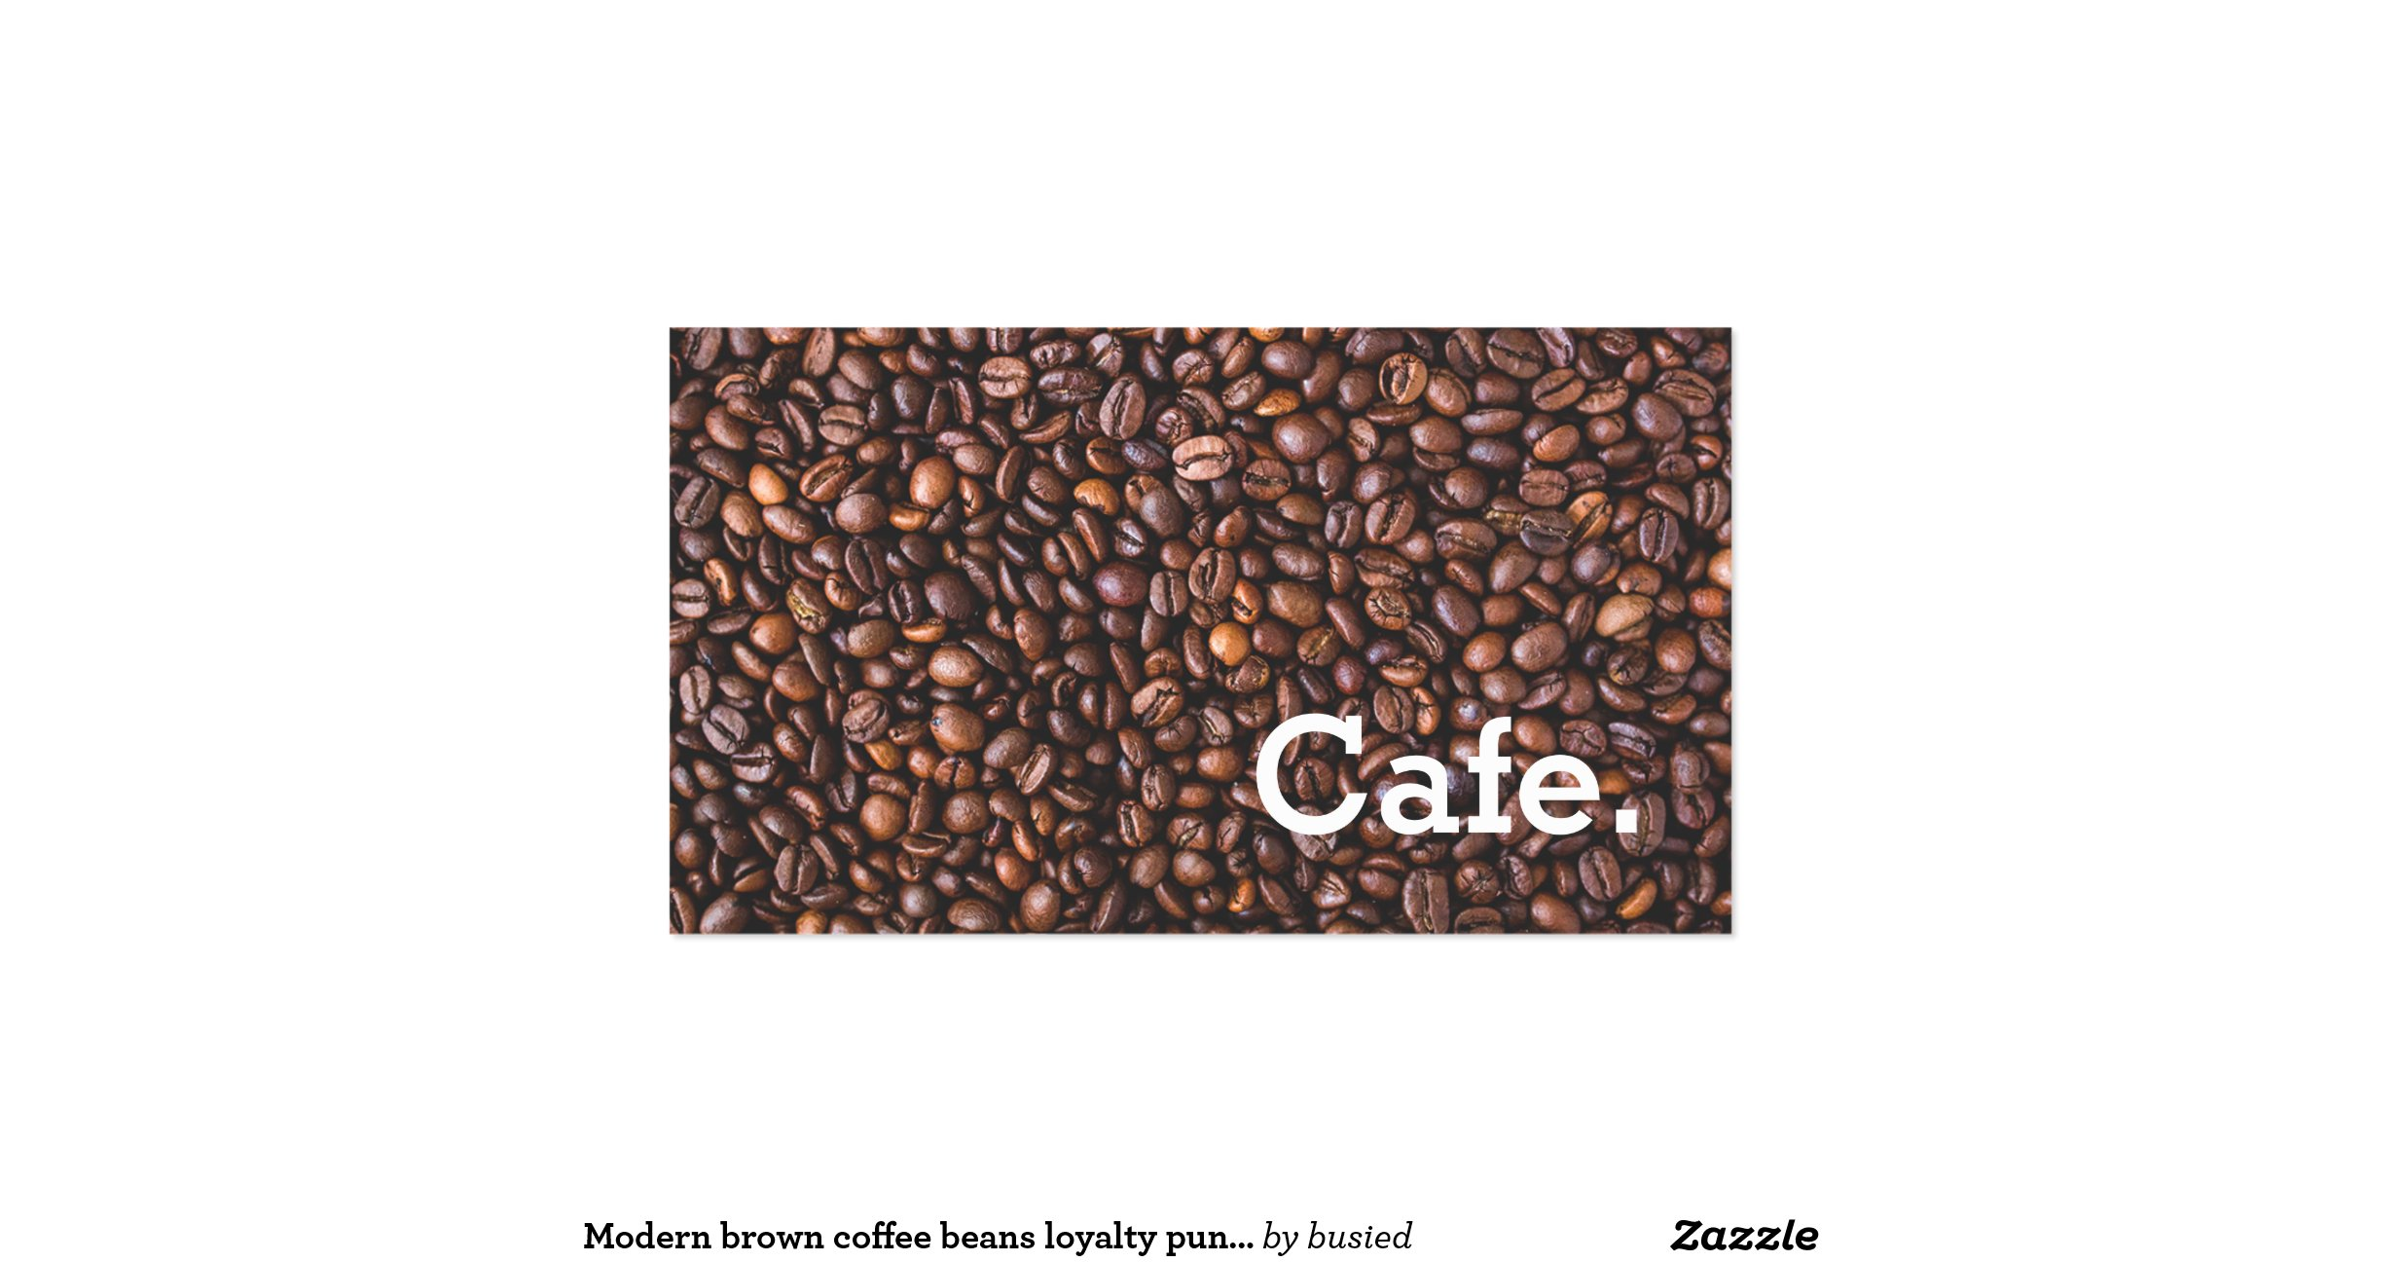 Modernbrowncoffeebeansloyaltypunchcardcafedouble